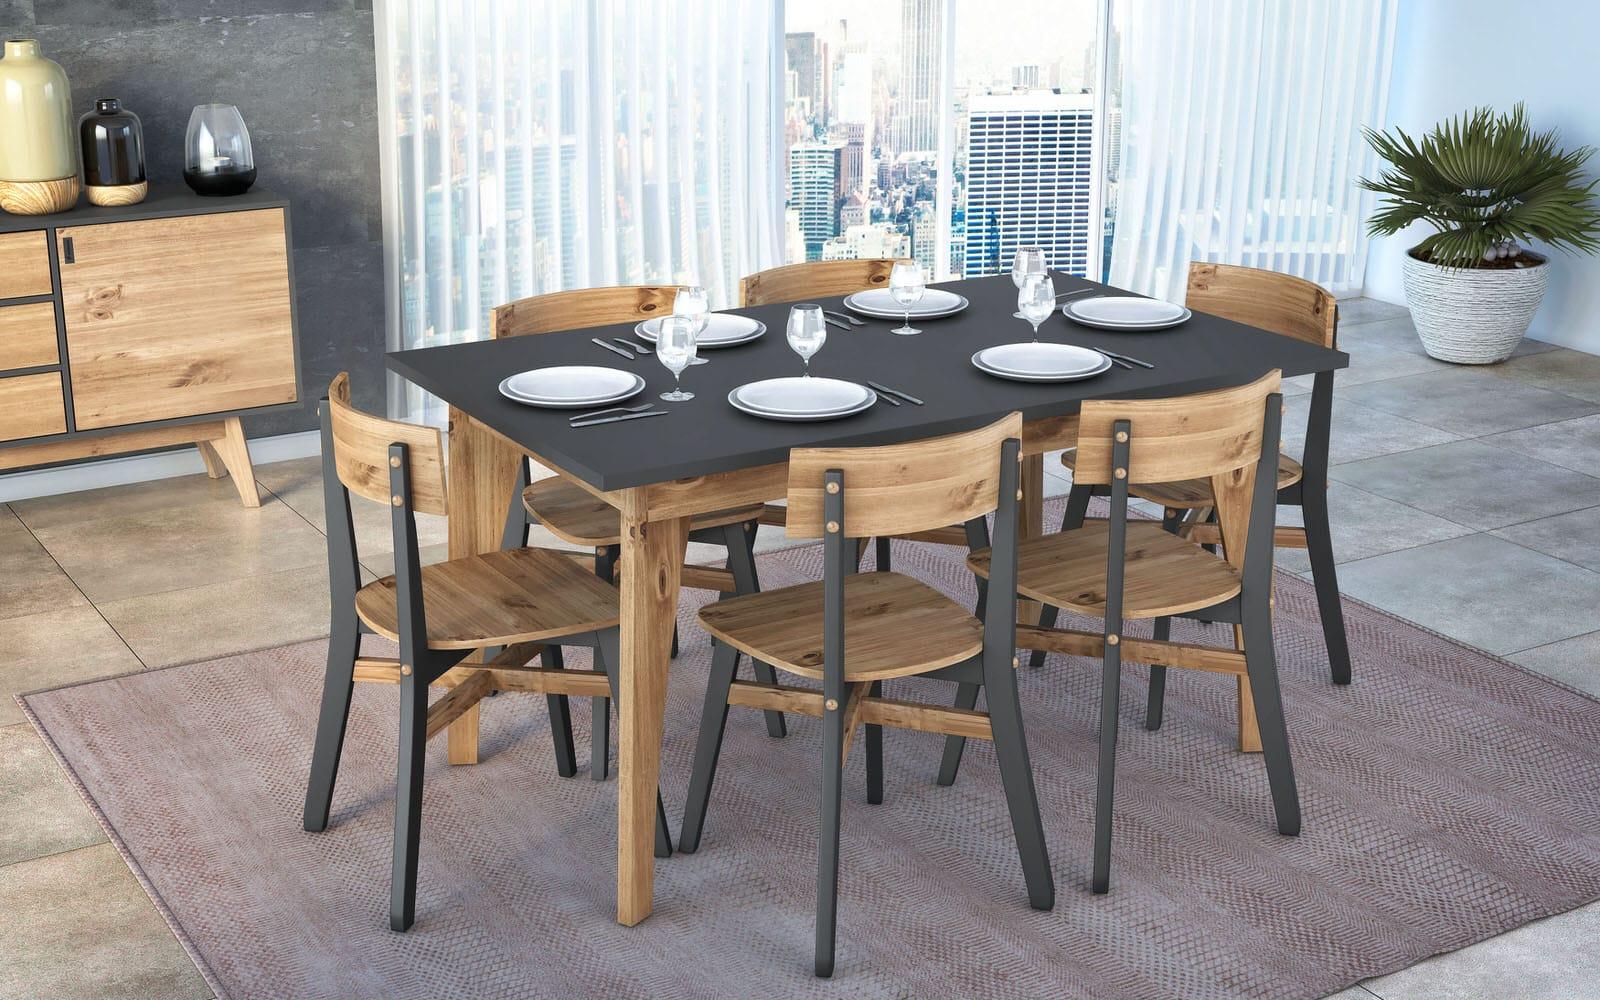 Rustic Mid Century Modern Jackie 6 Seating Dark Grey U0026 Natural Wood Dining  Table By Manhattan Comfort